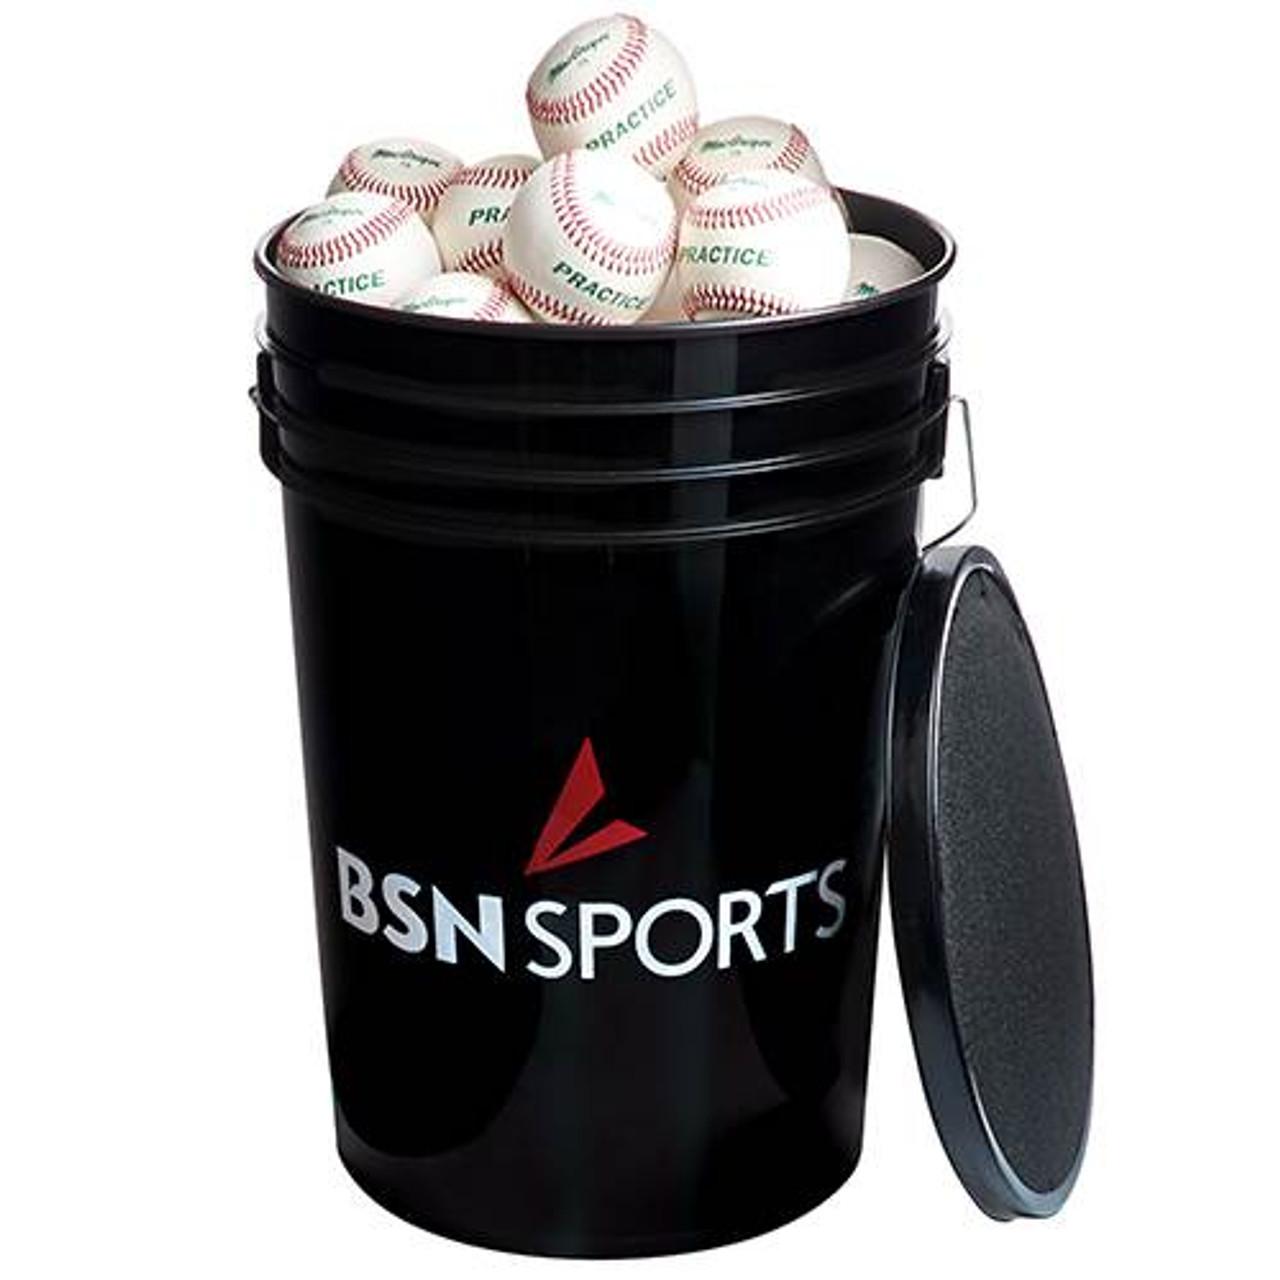 BSN SPORTS Bucket w/3 dz 79P Baseballs